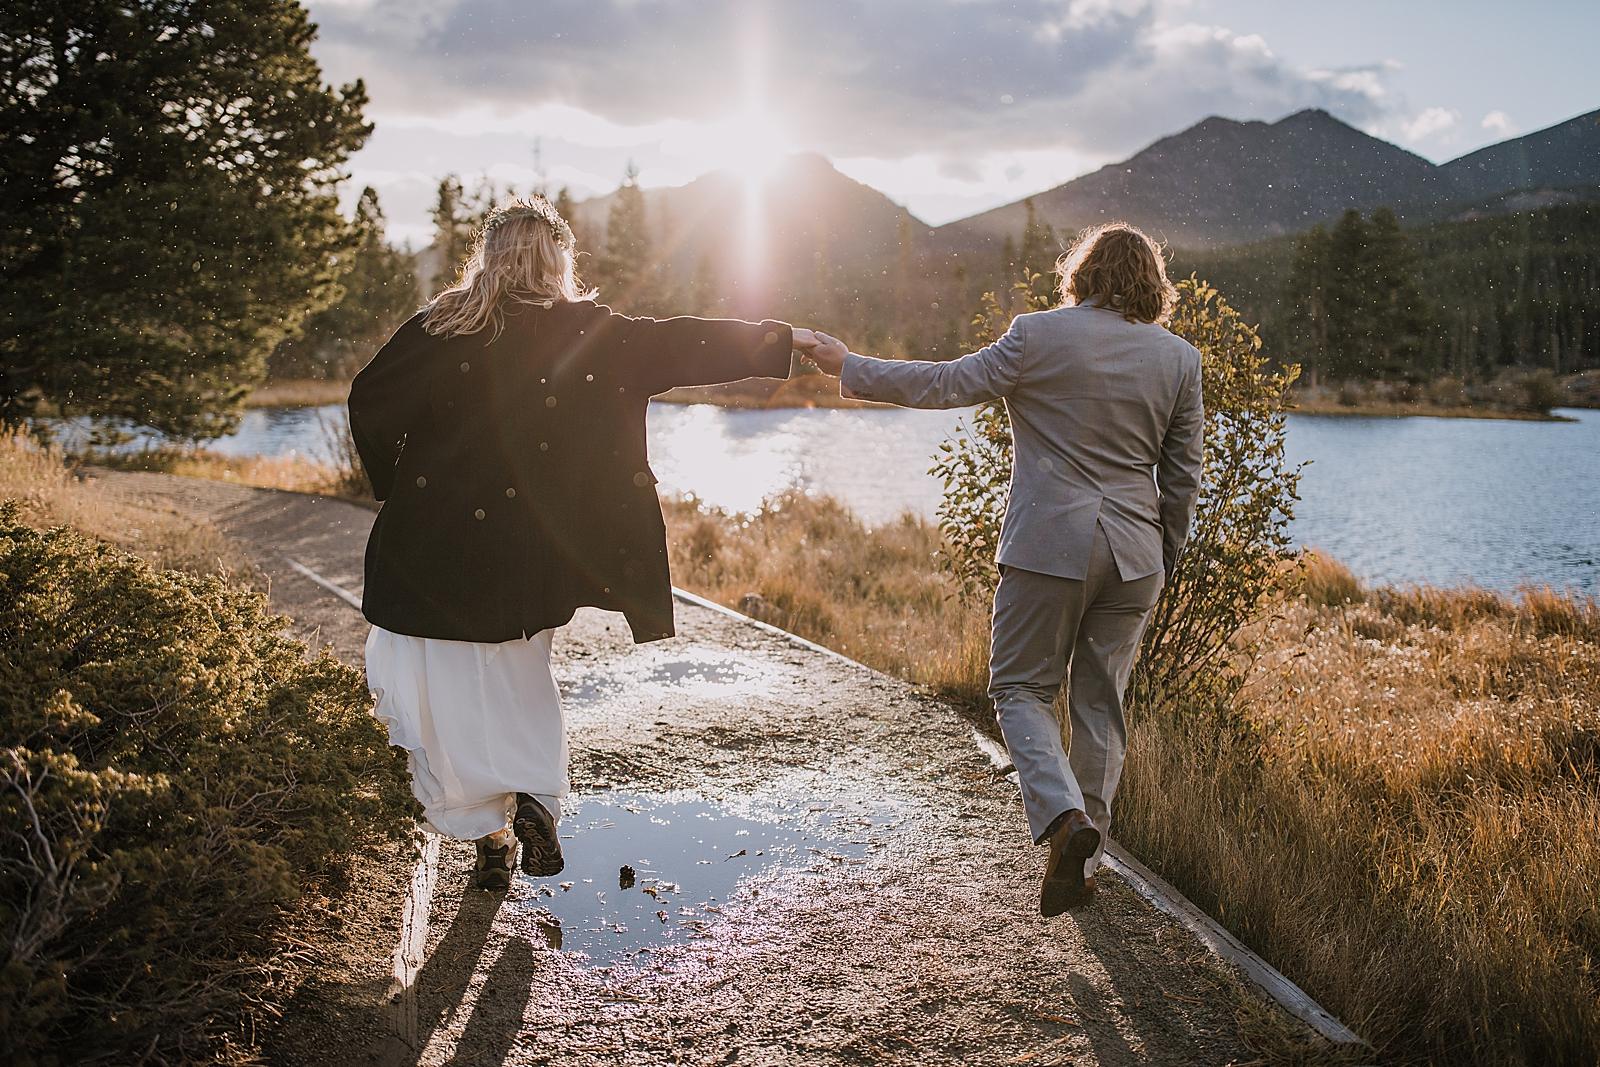 hiking in rmnp, sprague lake dock elopement, sunrise elopement, colorado elopement, sprague lake elopement, rocky mountain national park elopement, adventurous colorado hiking elopement